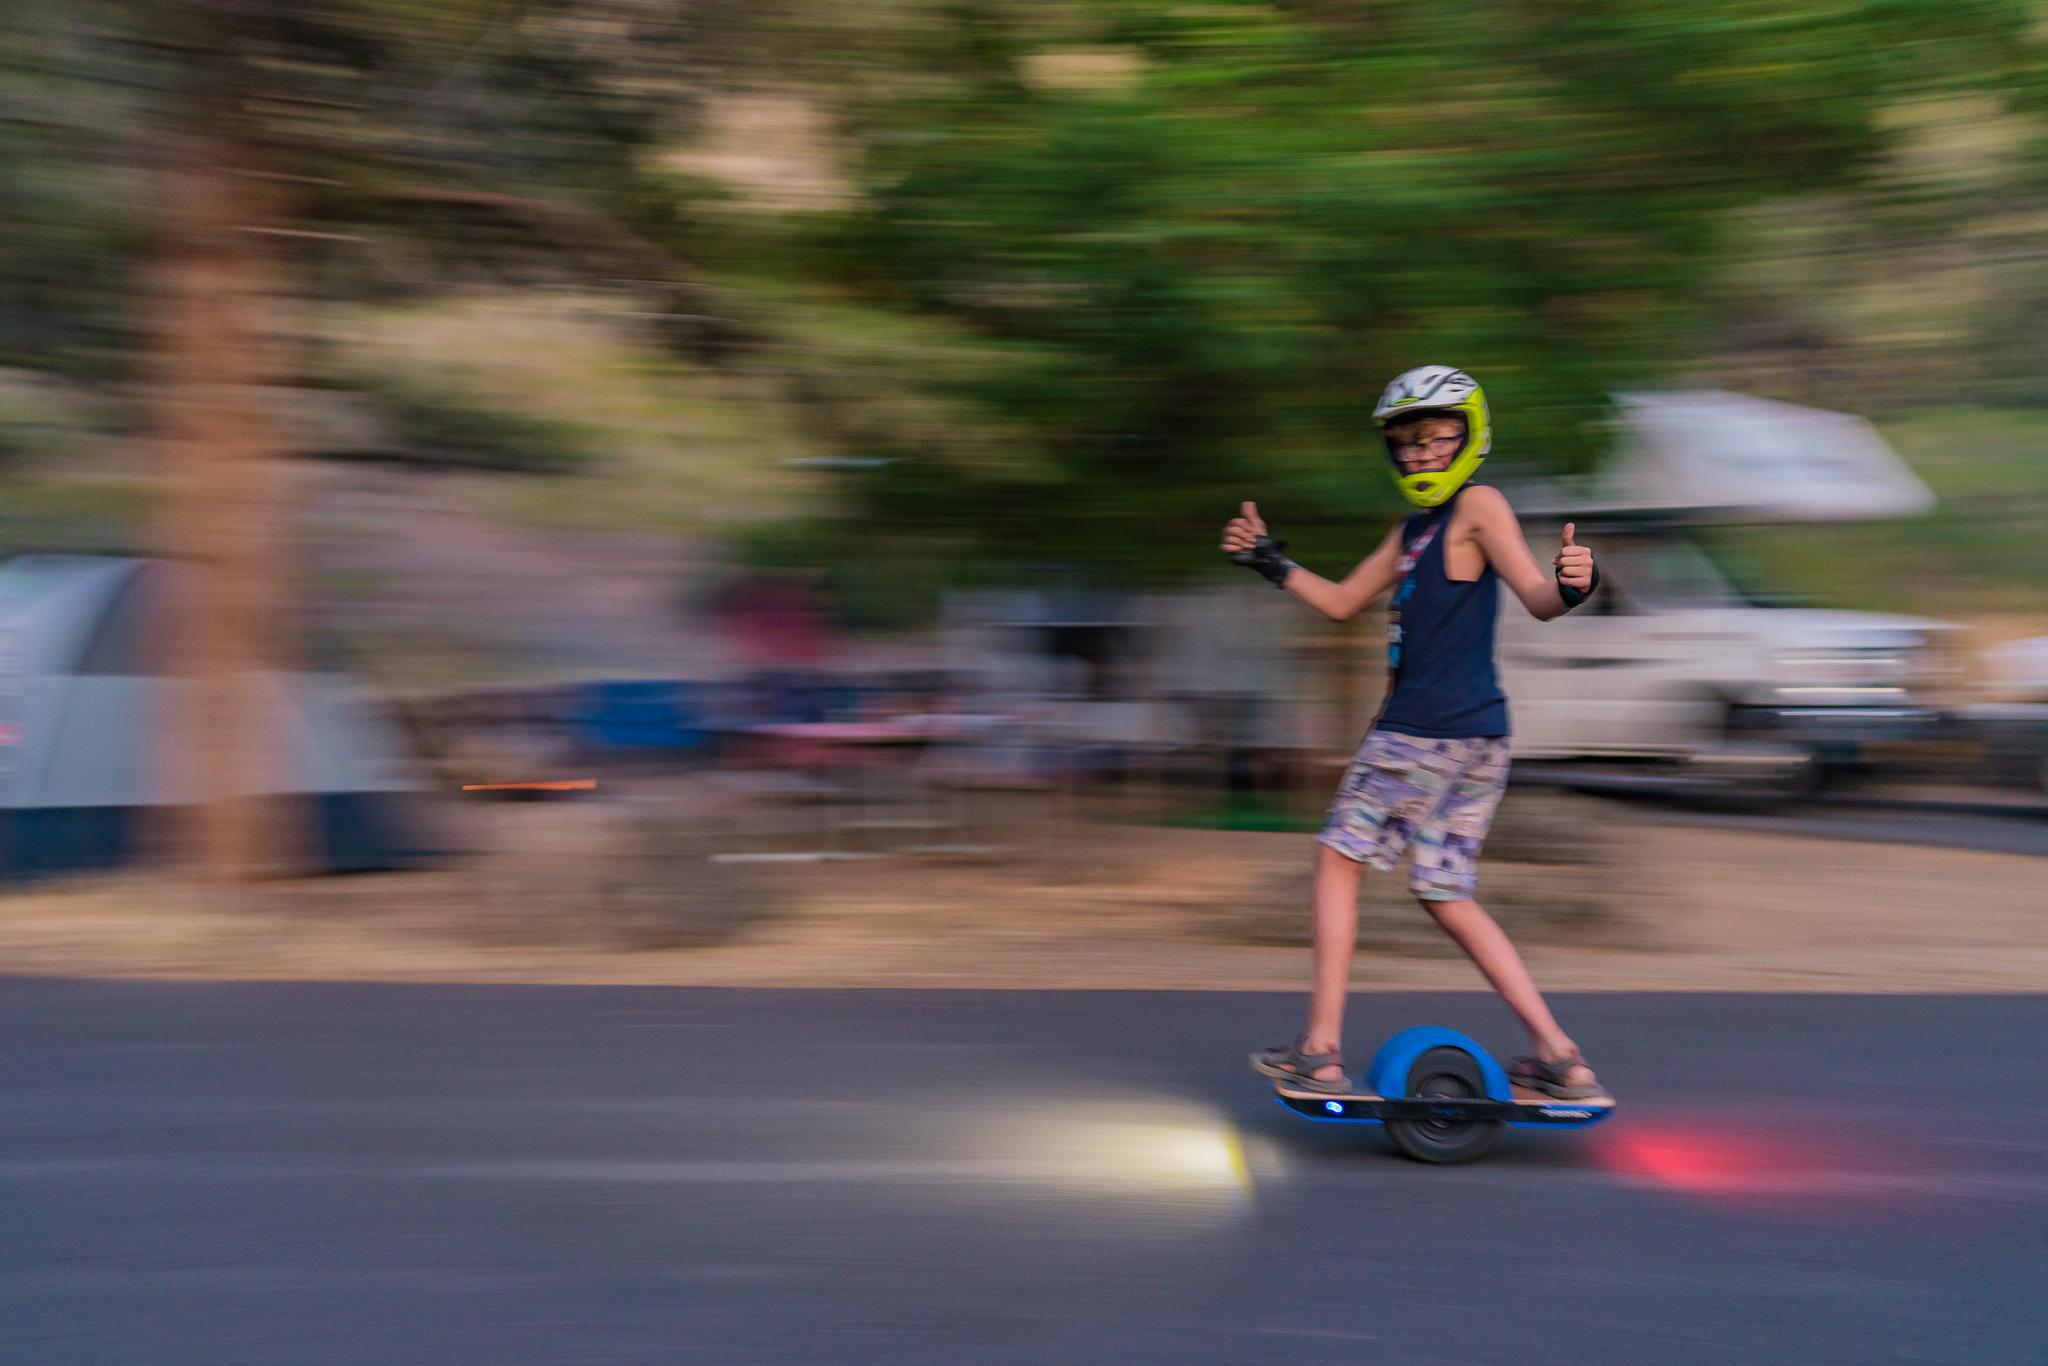 kids stay safe on one wheel